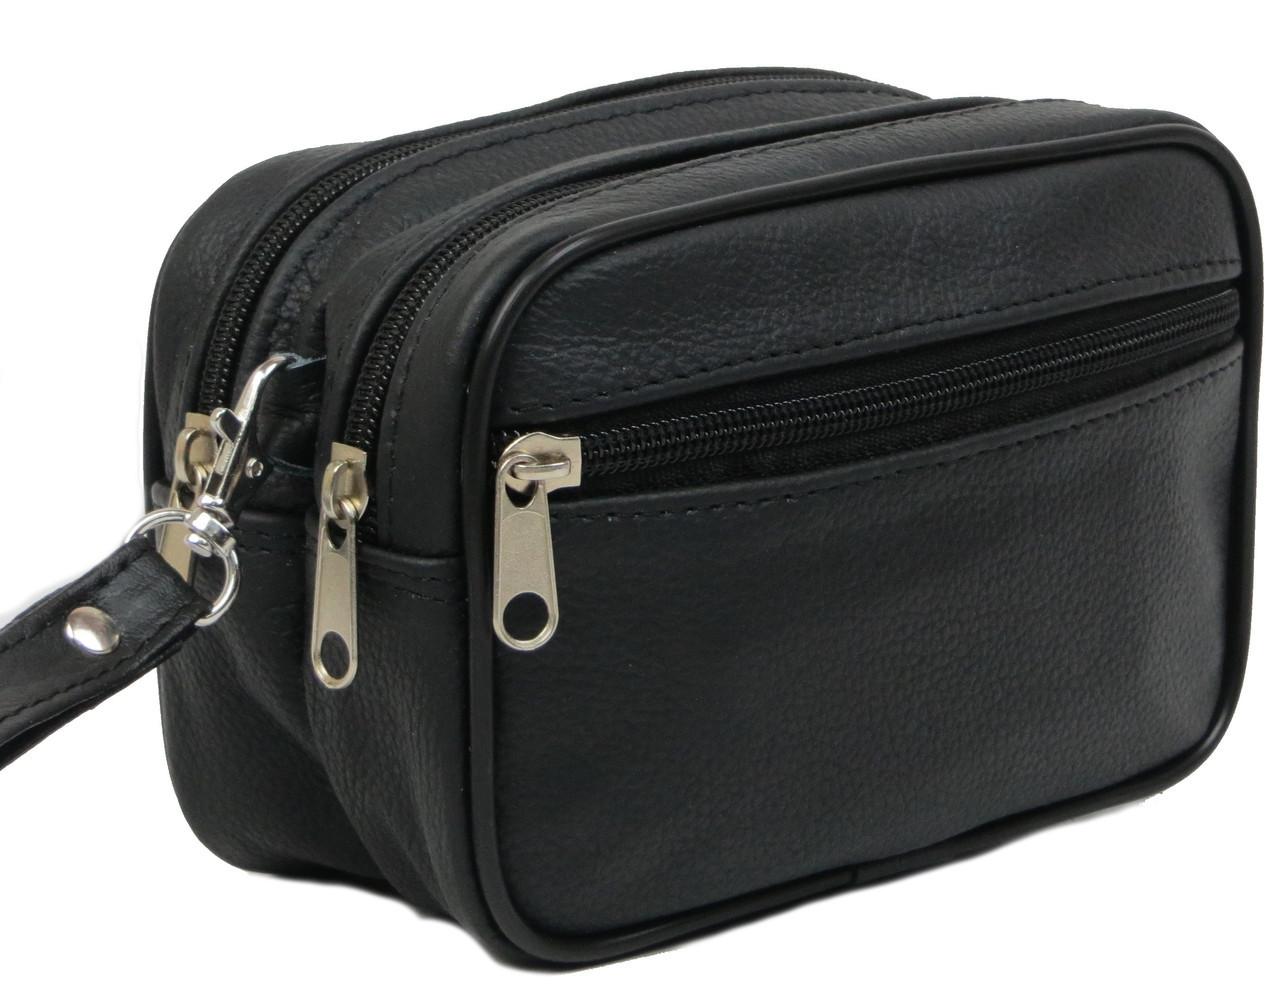 Кожаная сумка-барсетка на ремень Pawelek ss-18 11-160, фото 1